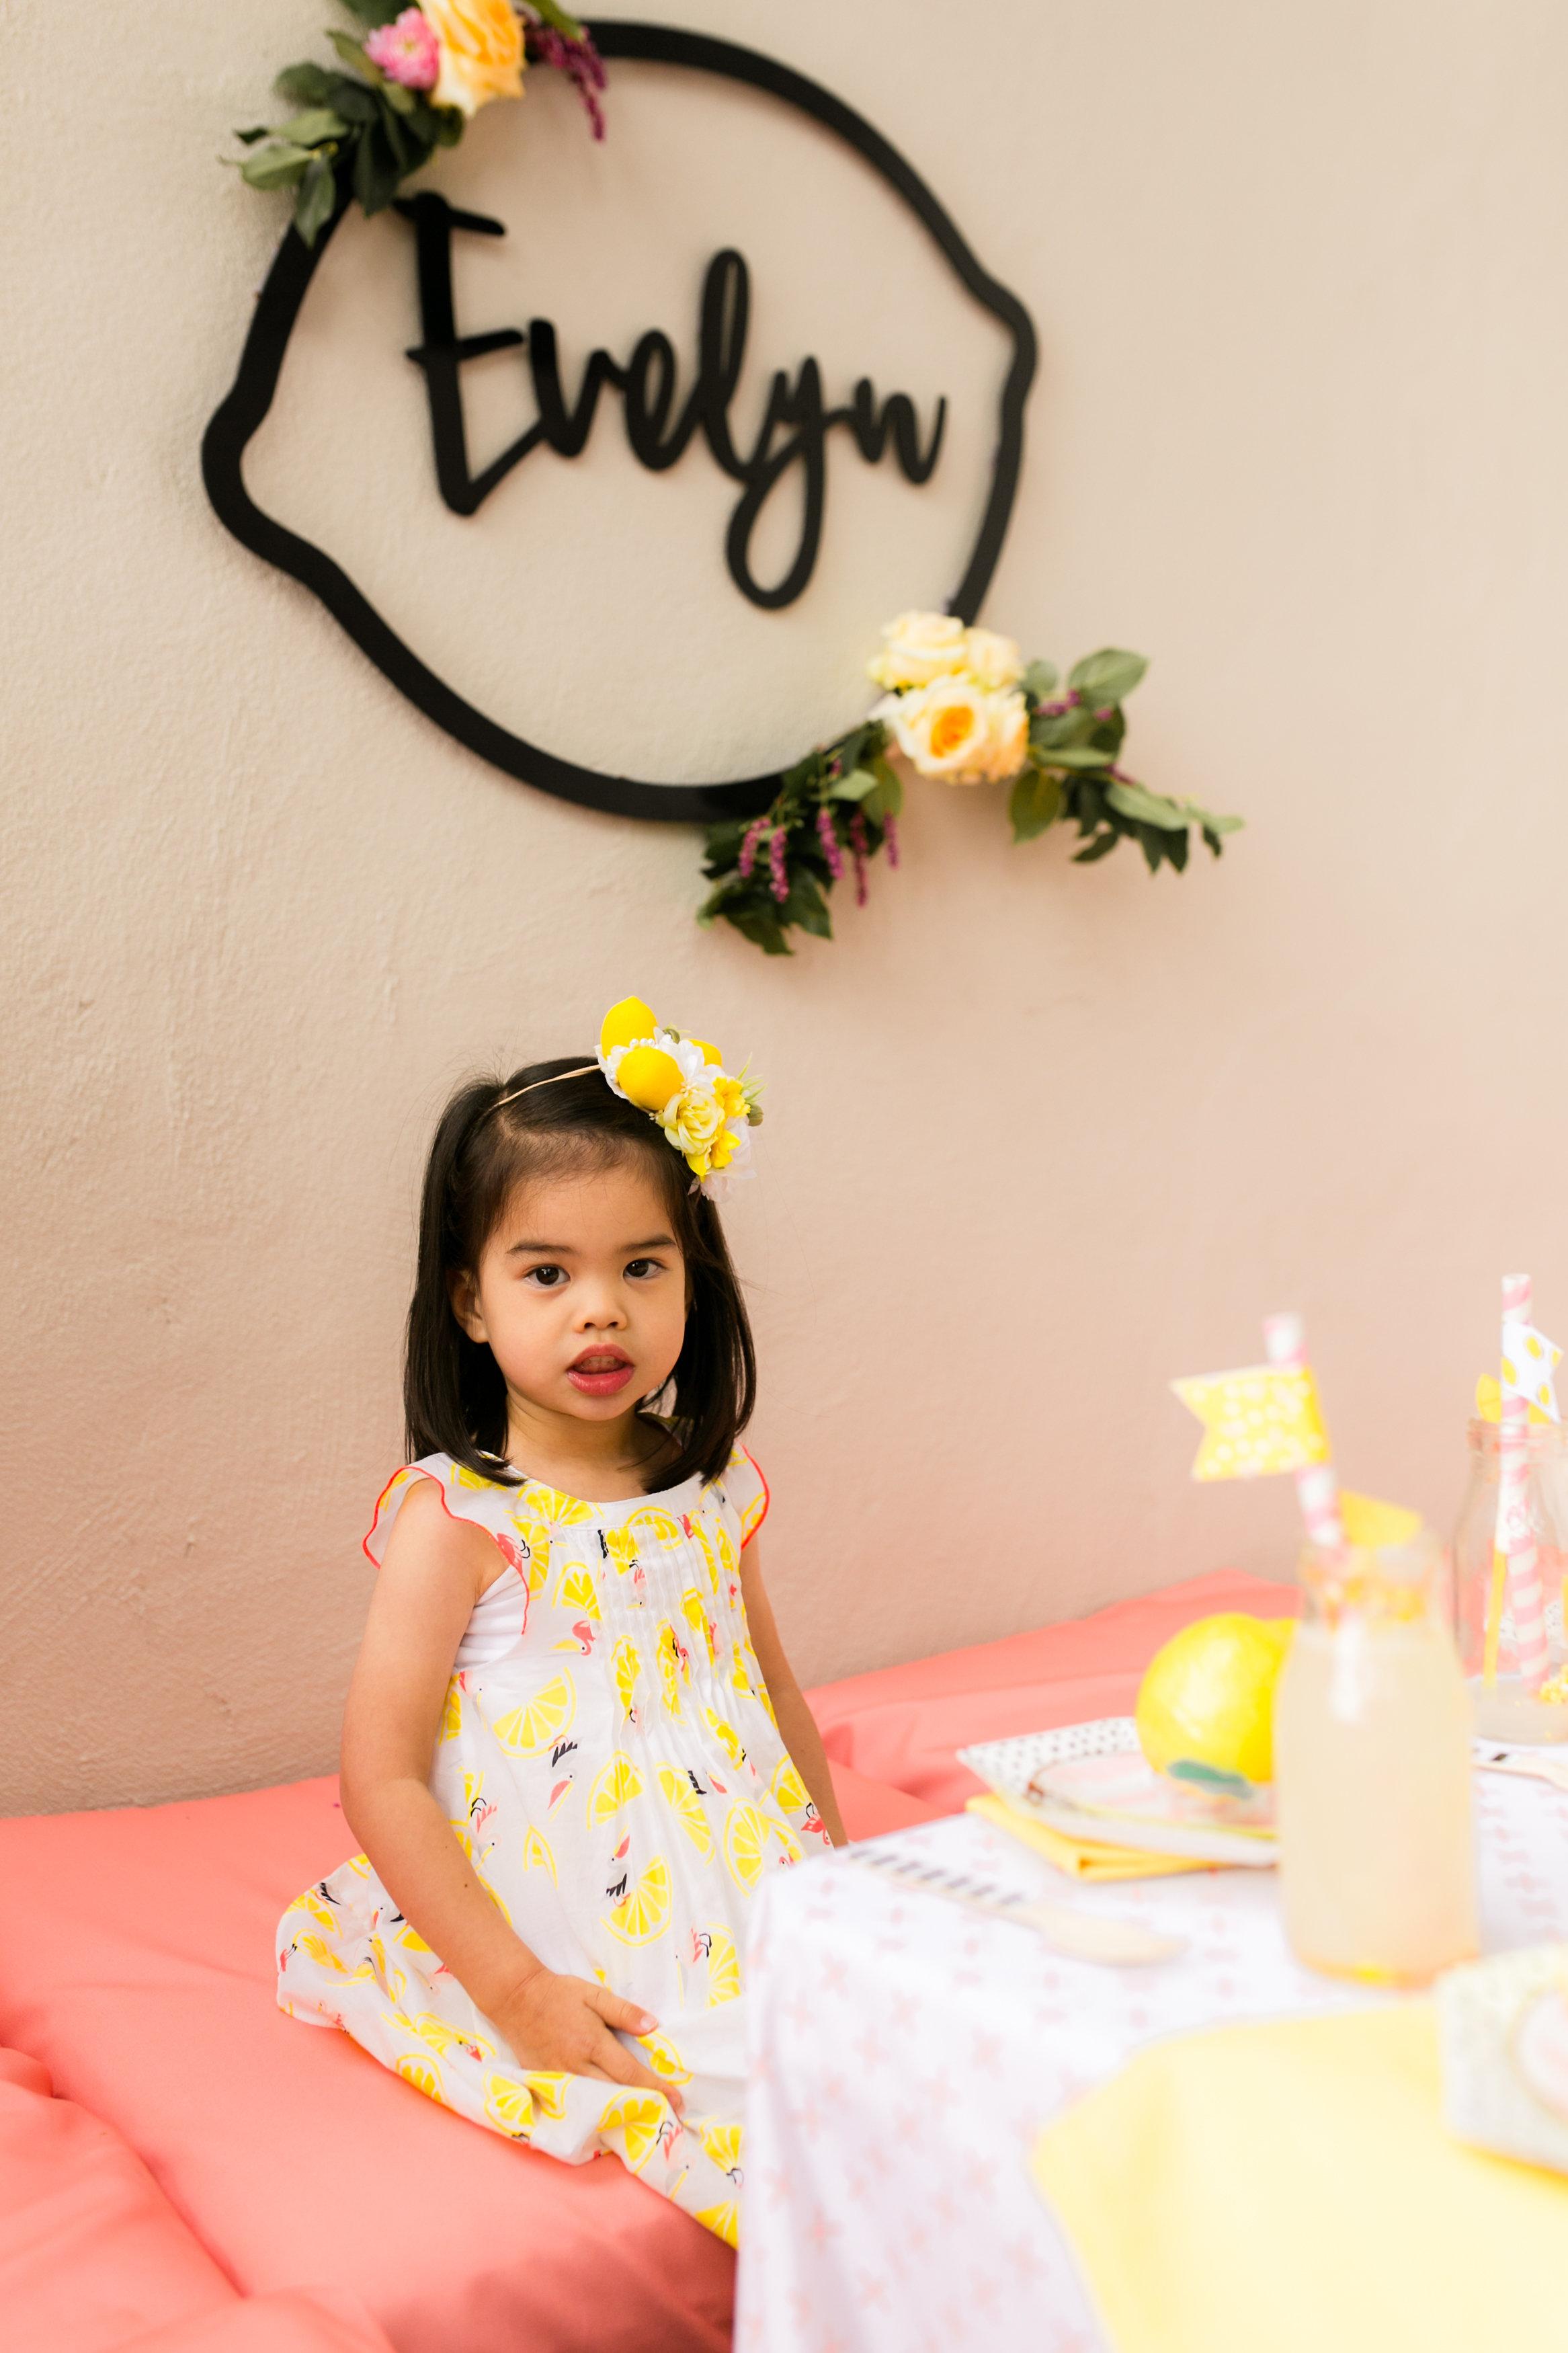 Lemonade Little Girls Birthday Party - Girls Party dress